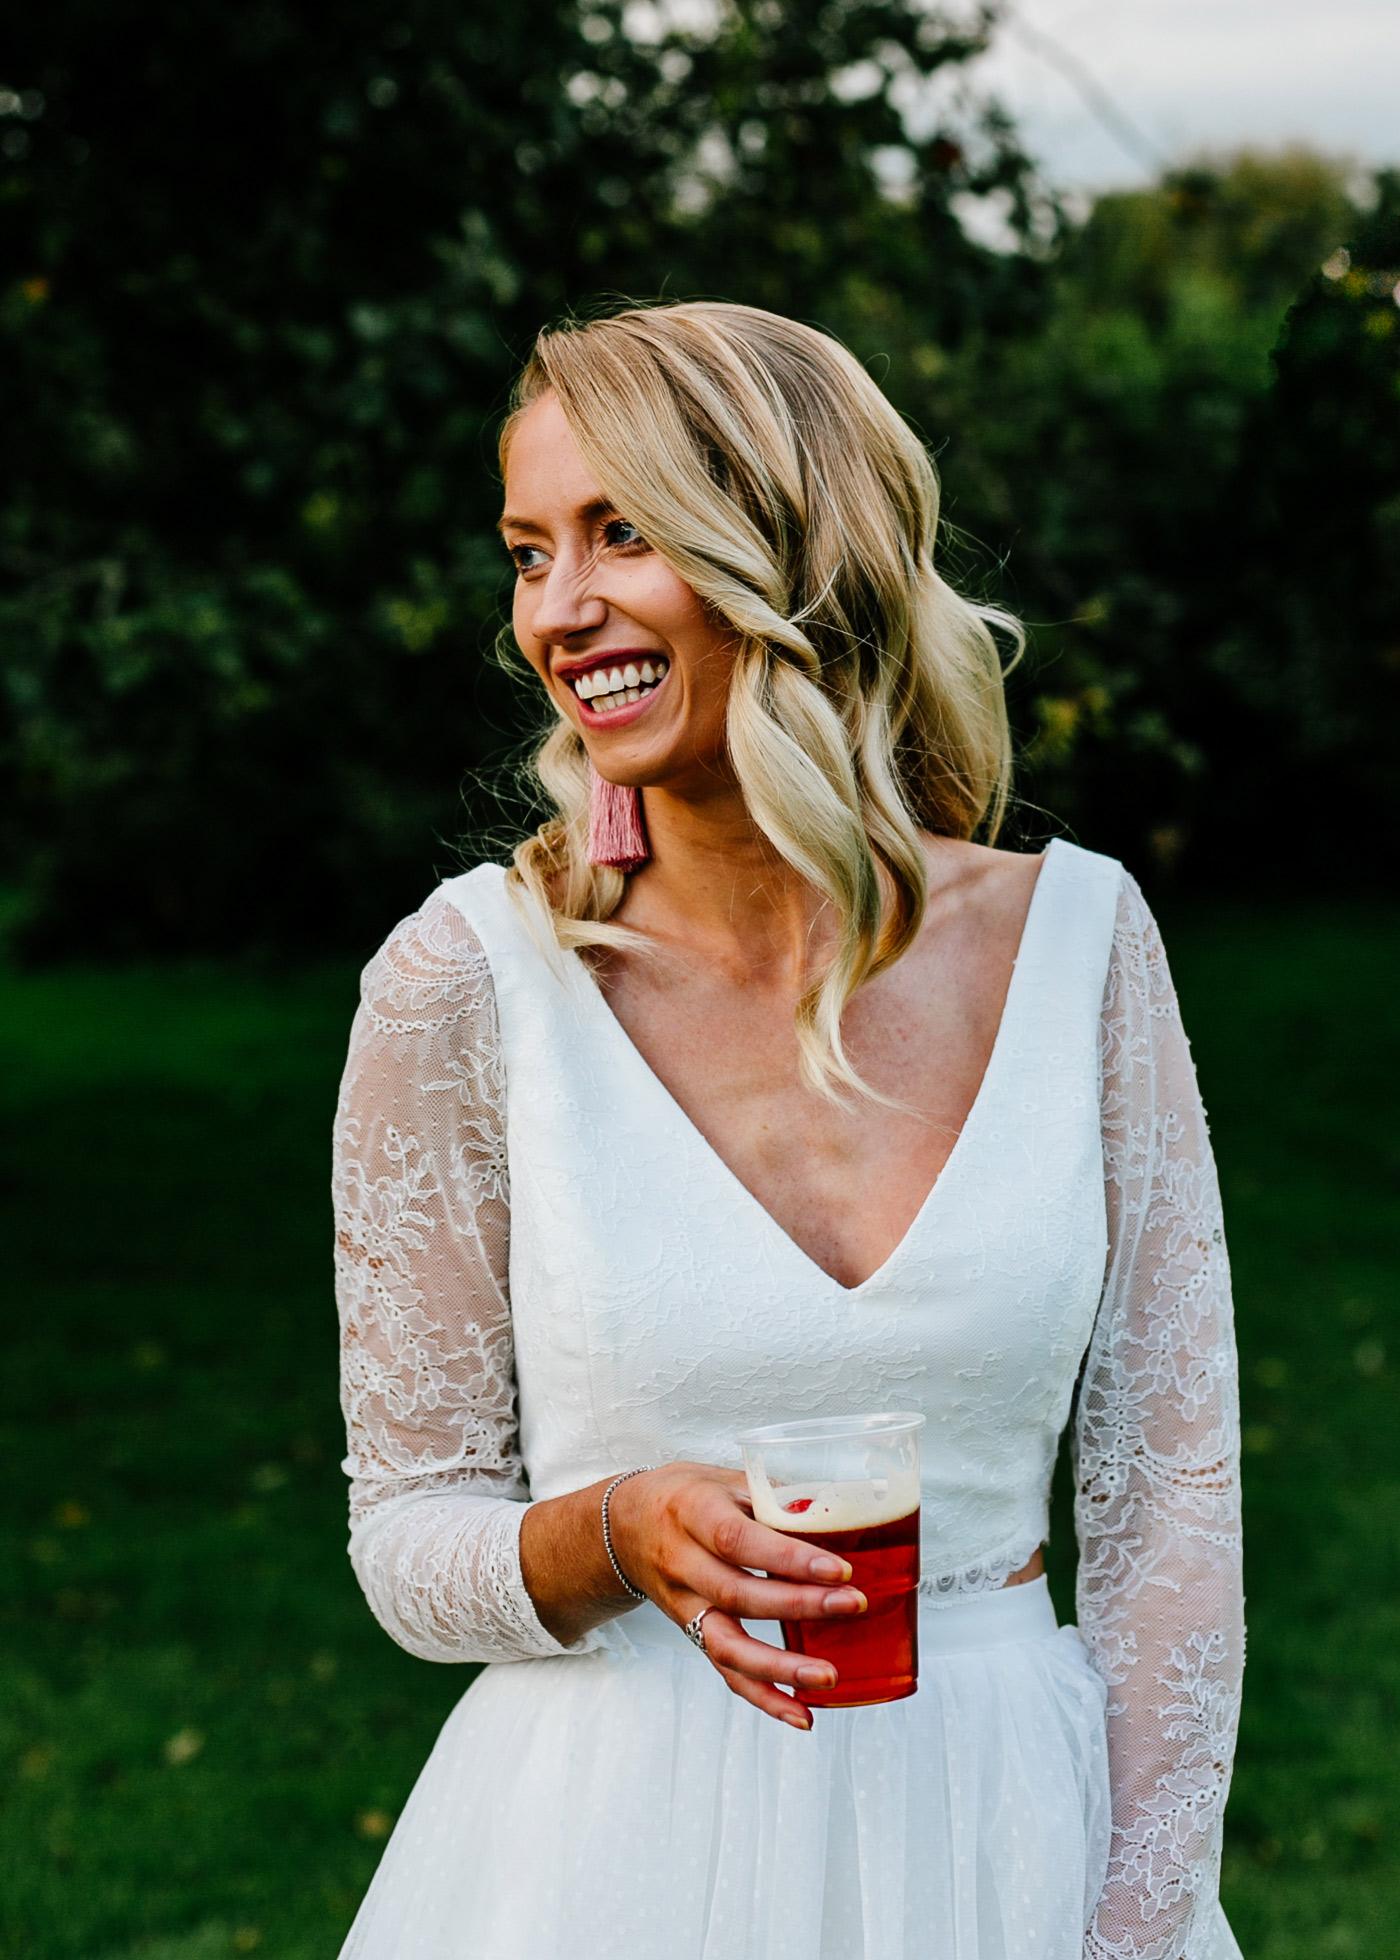 KENT-ELOPEMENT-wedding-photographer-UK-London-Epic-Love-Story-004